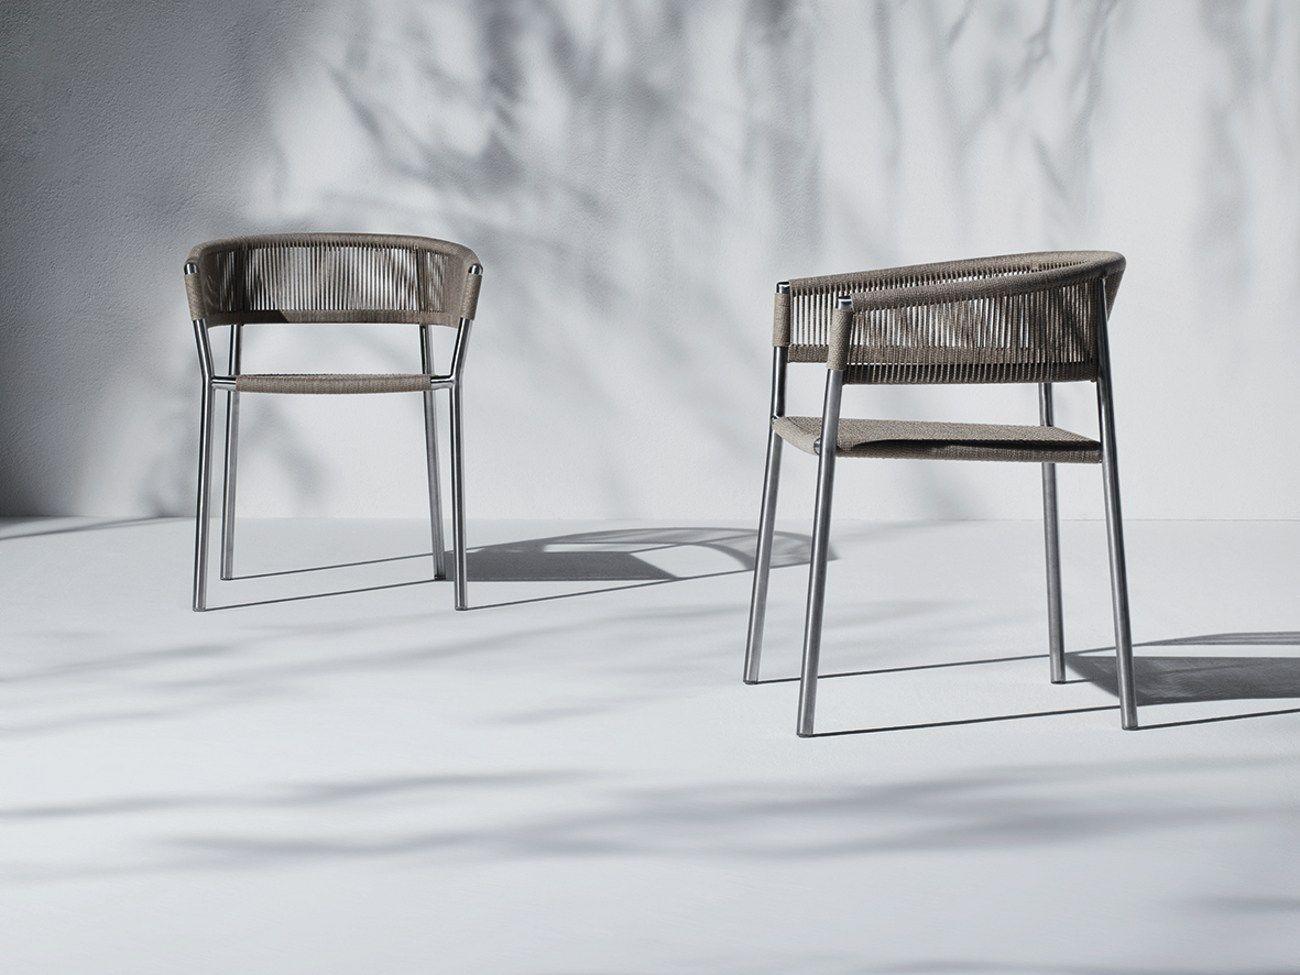 marcello ziliani / sedia kilt da ethimo | 家具 | Pinterest | Kilts